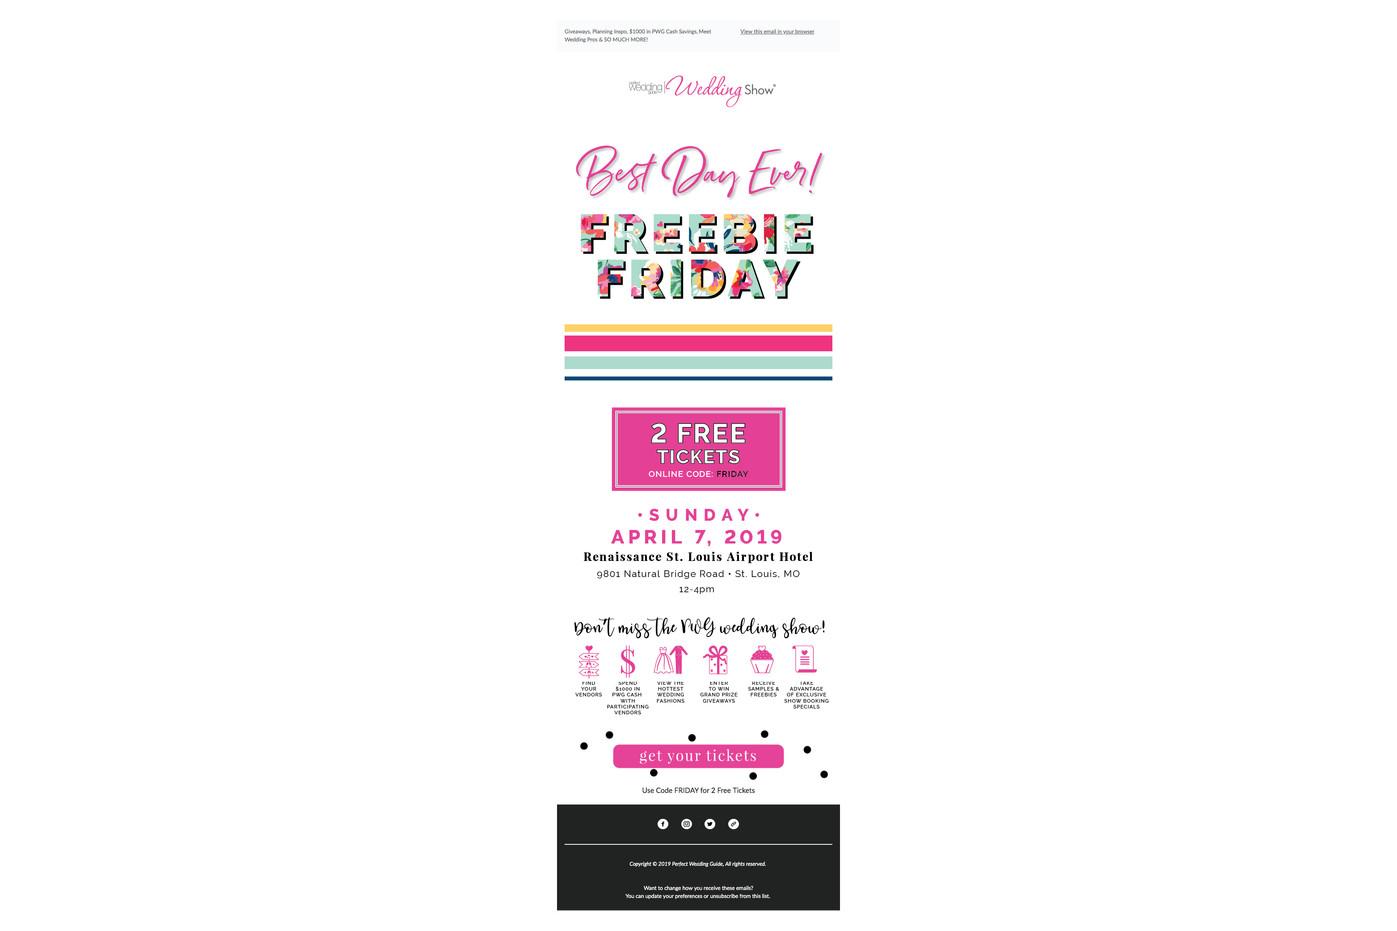 Digital-Email Campaign Freebie Friday.jp